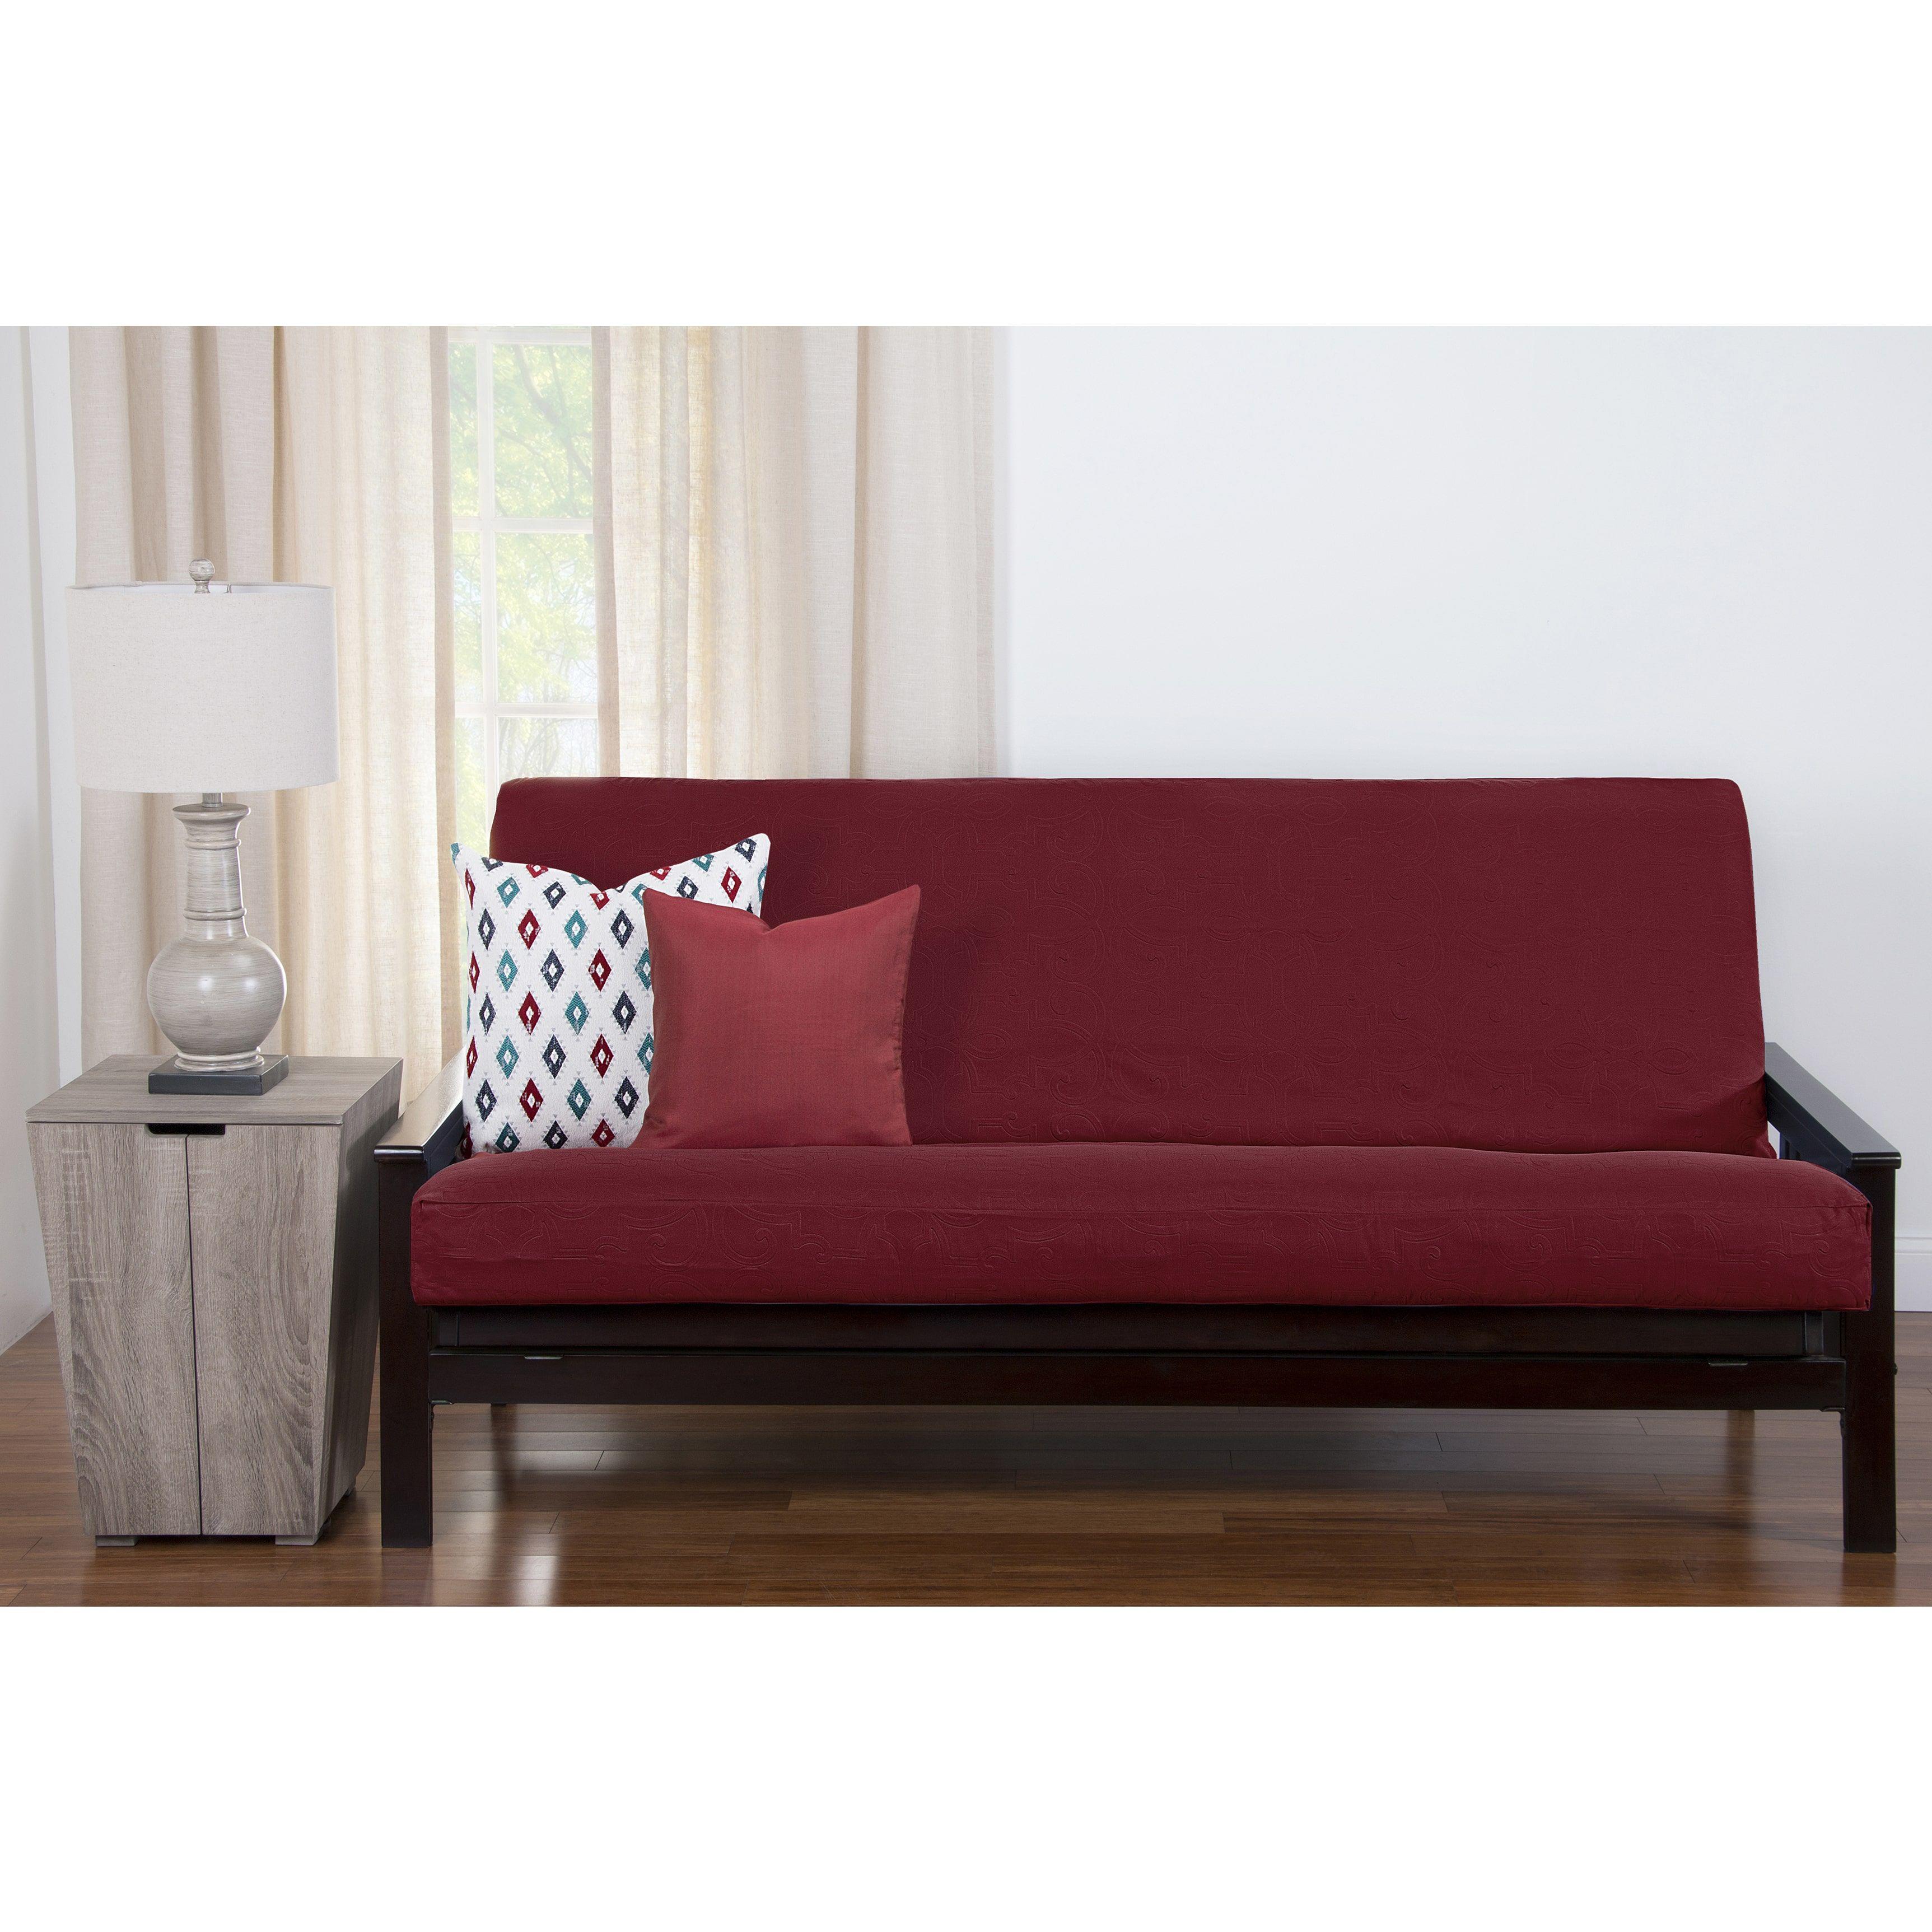 pologear gateway brick futon cover pologear gateway brick futon cover by pologear   futon covers  rh   pinterest